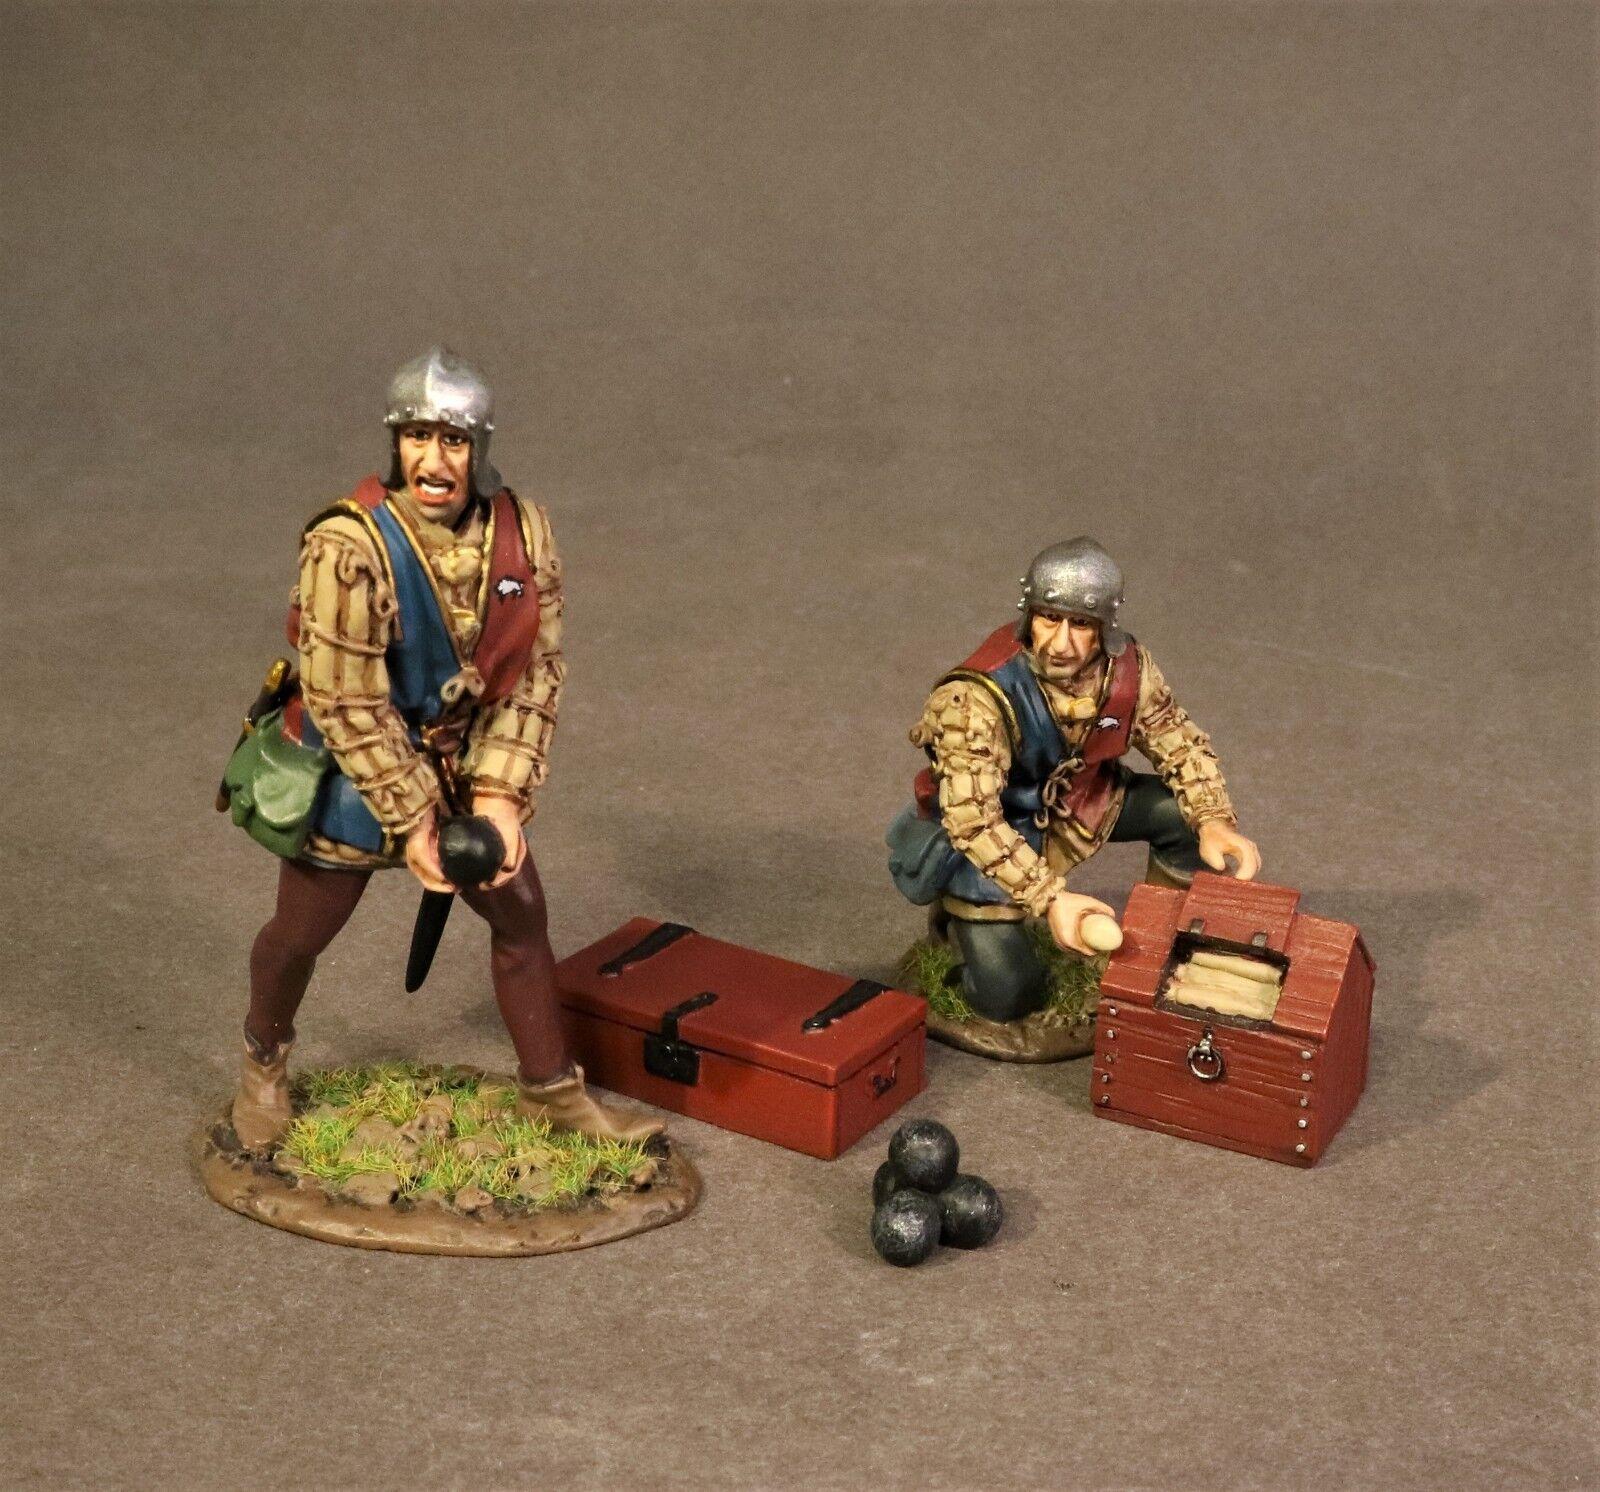 JOHN JENKINS WAR OF THE pinkS RYORKART-02 TWO MAN ARTILLERY CREW MIB